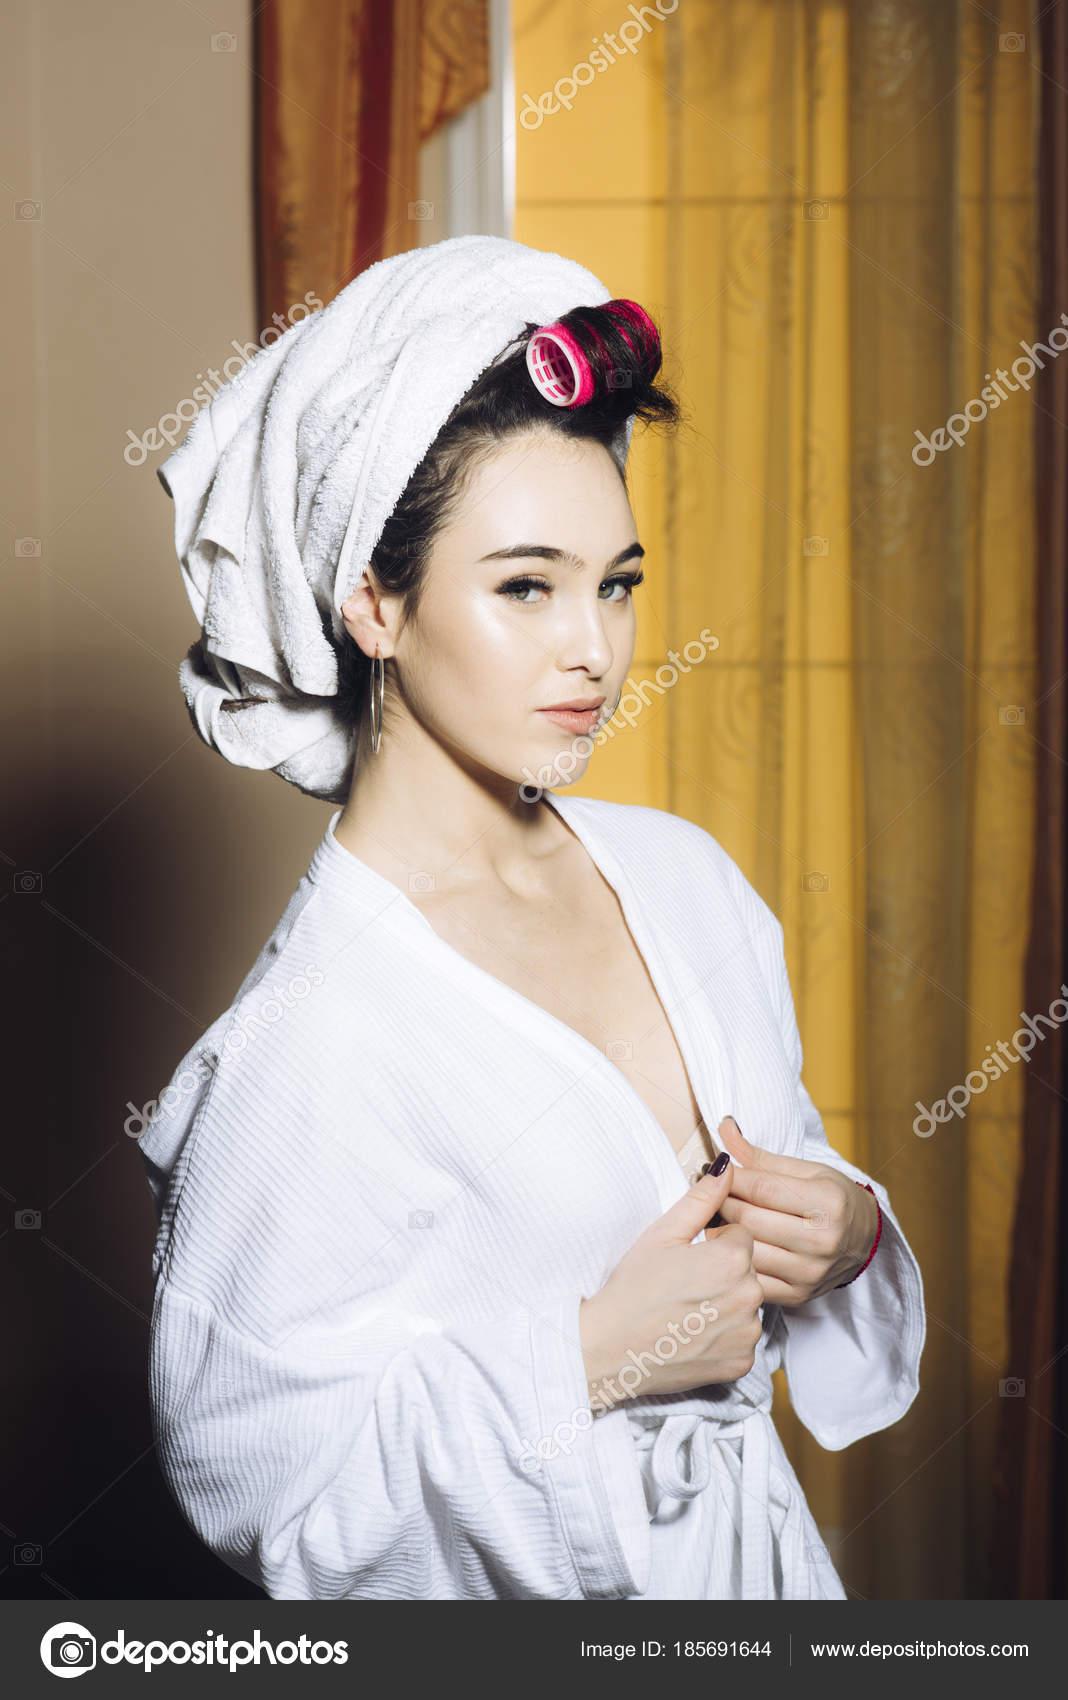 Girl bathrobe flash nude can not